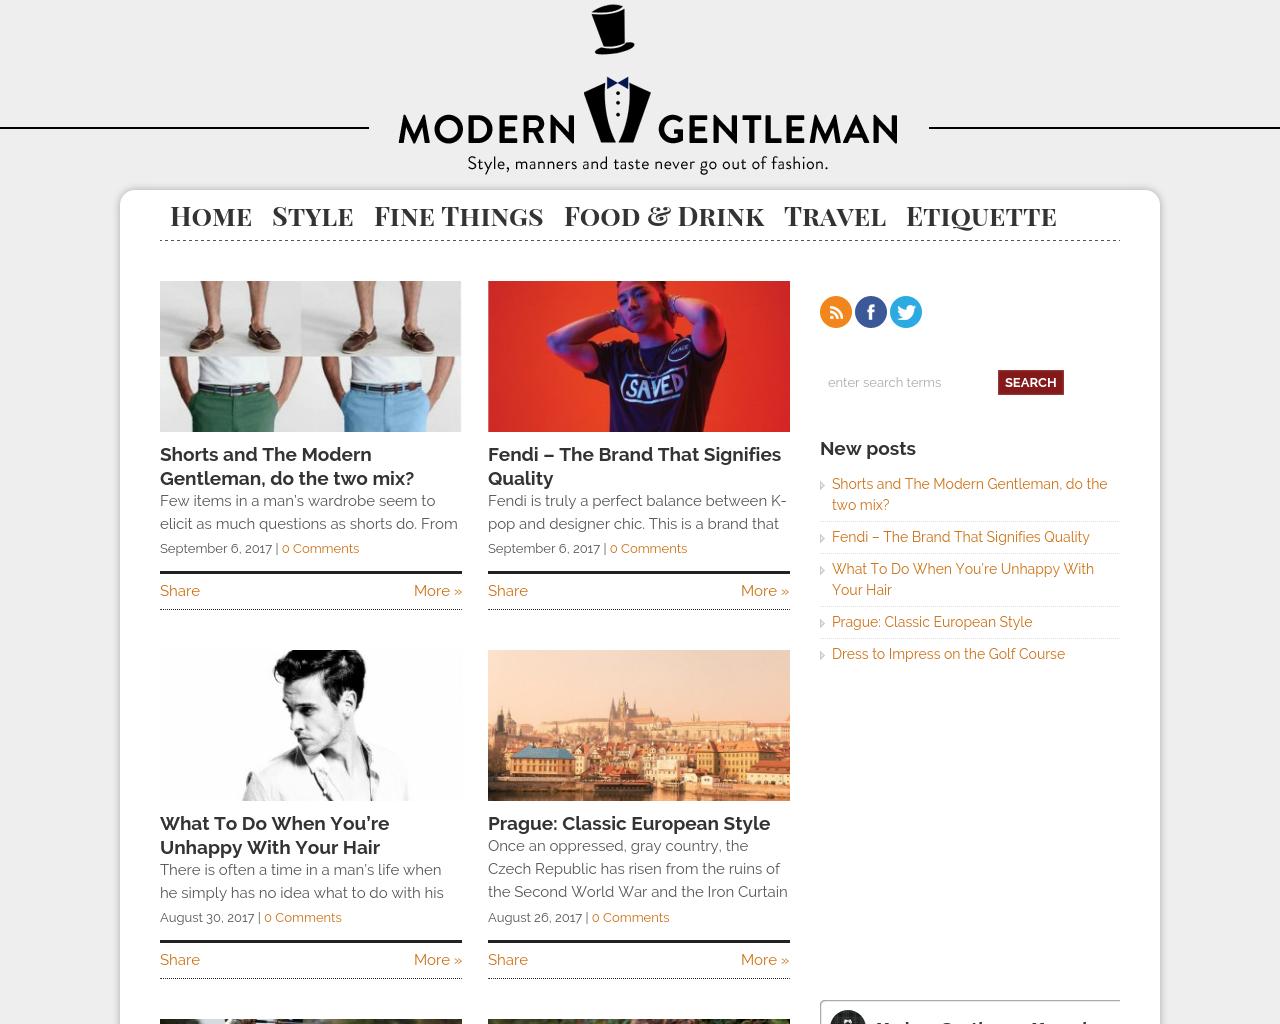 Modern-Gentleman-Advertising-Reviews-Pricing